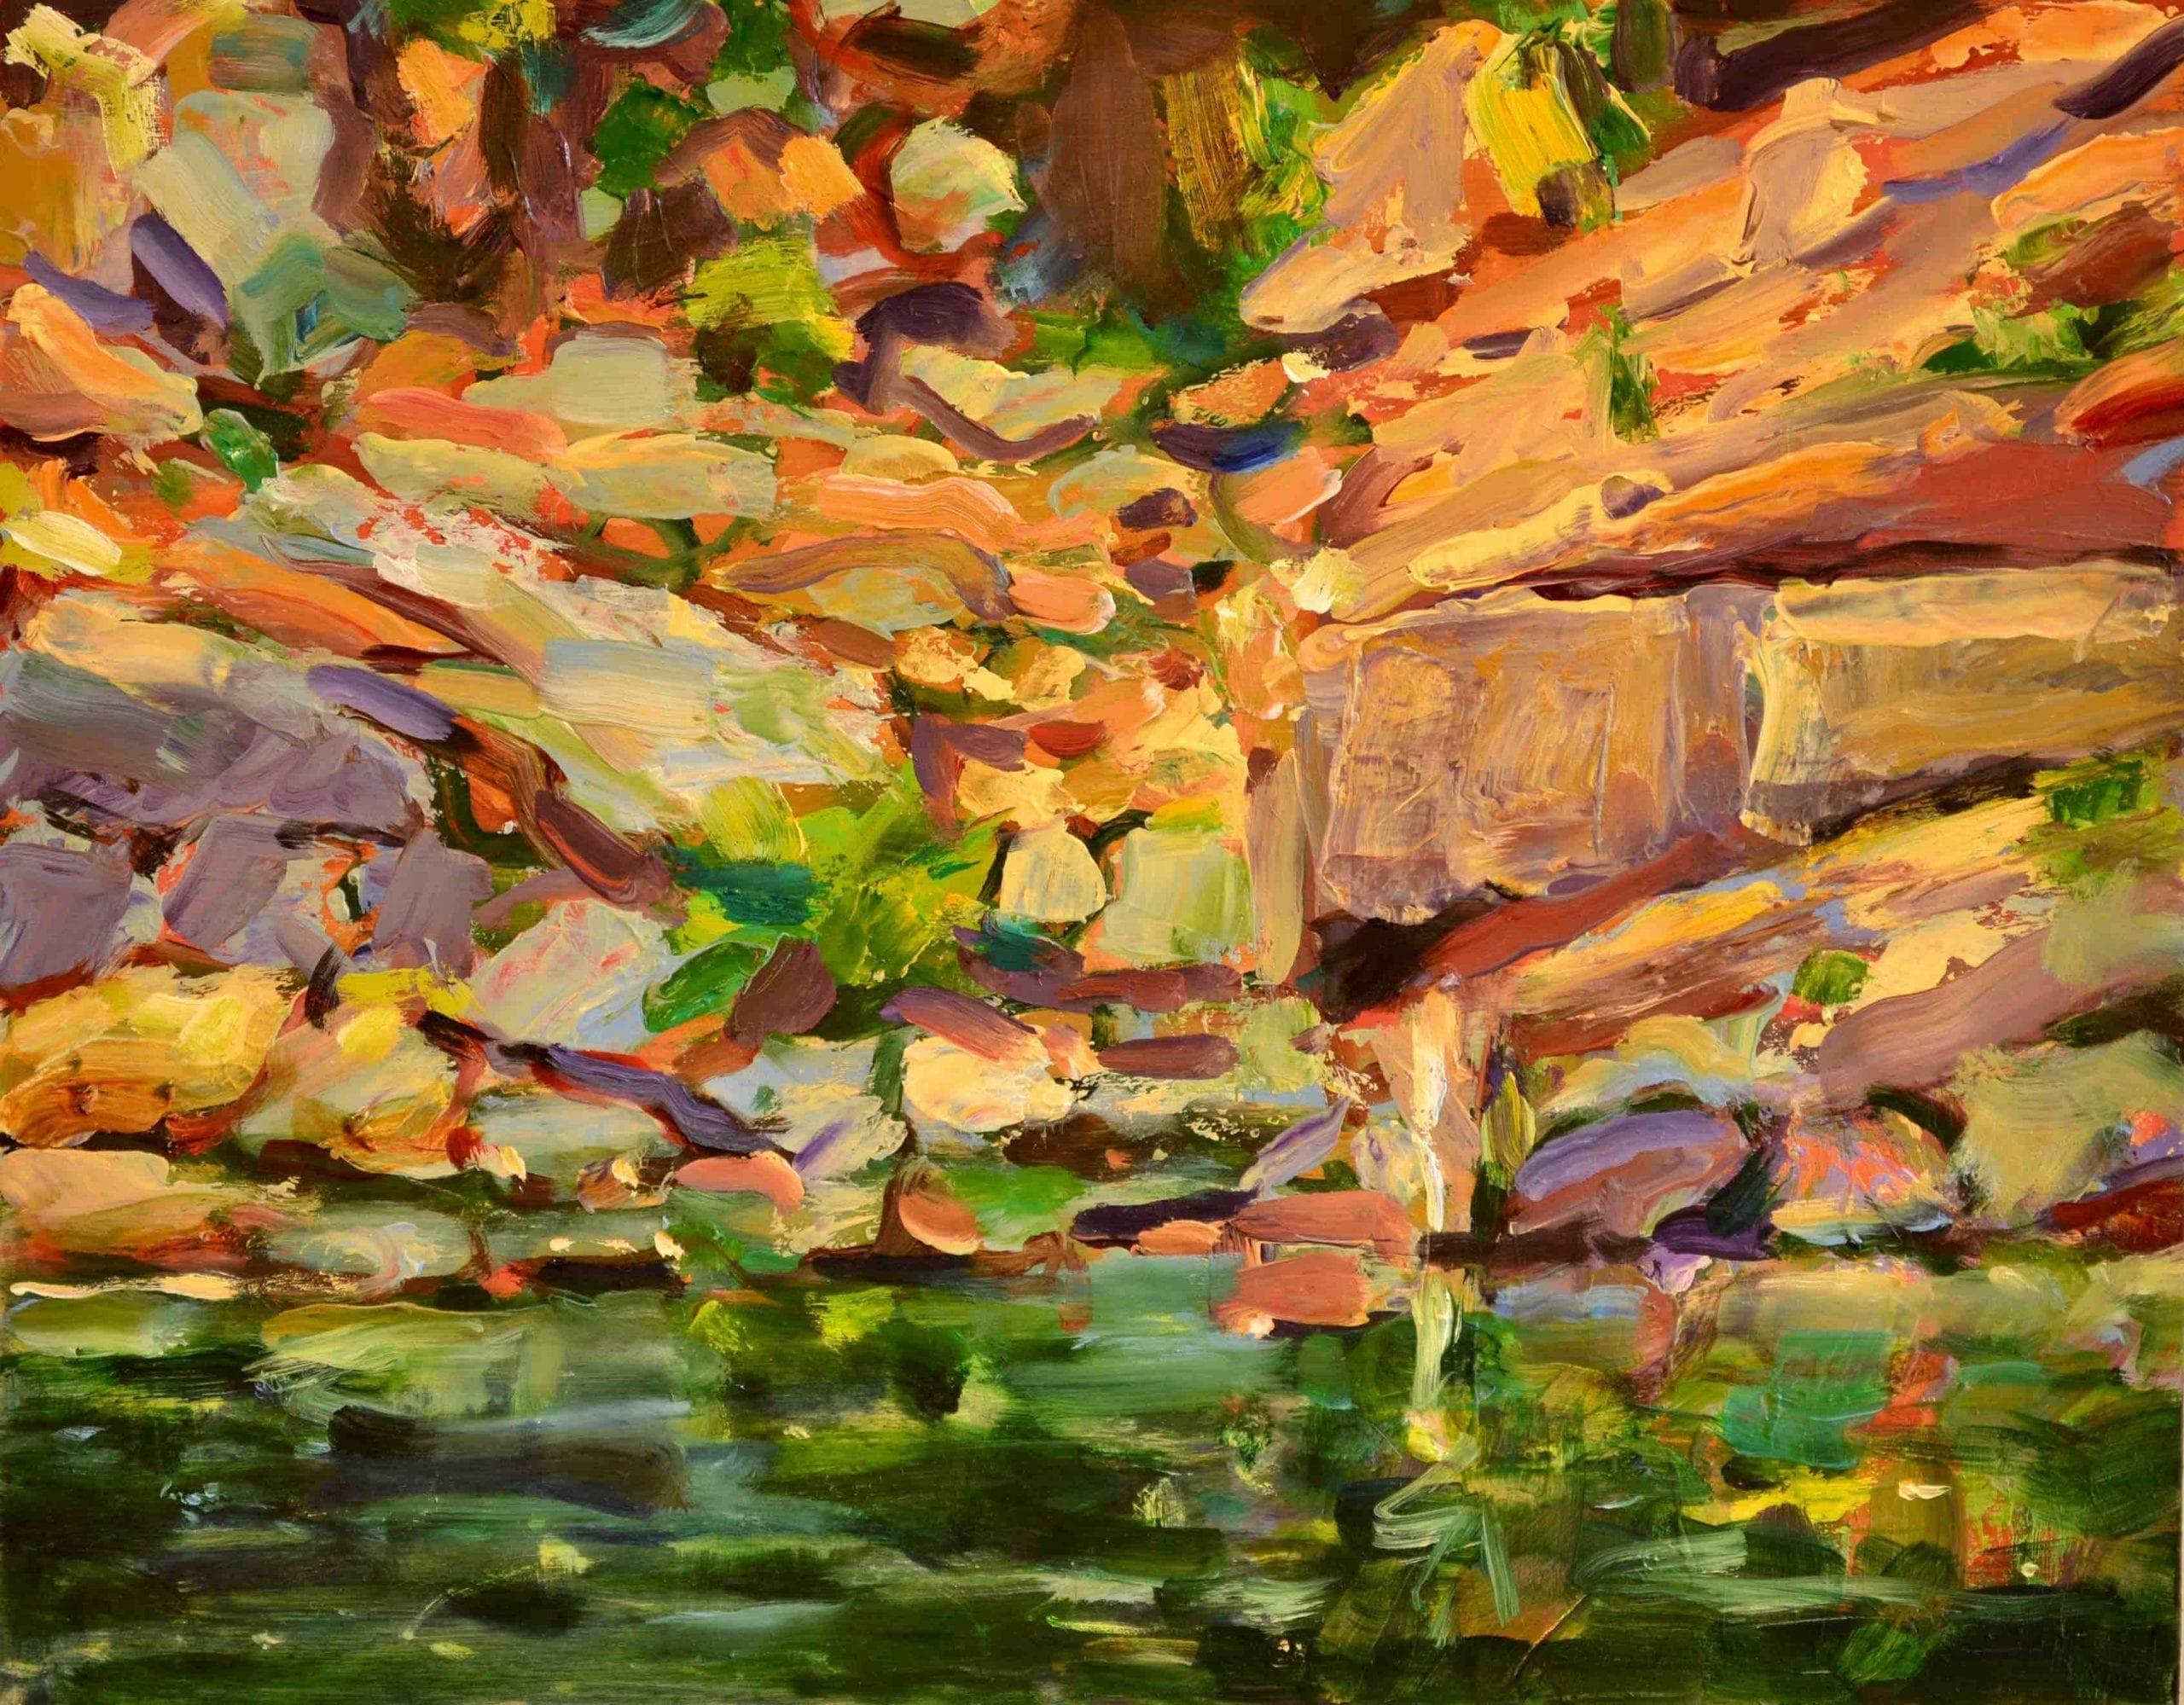 "Pat Mahony - Rockfall Meeting River - 2020 - Oil on Linen - 11"" x 14"""